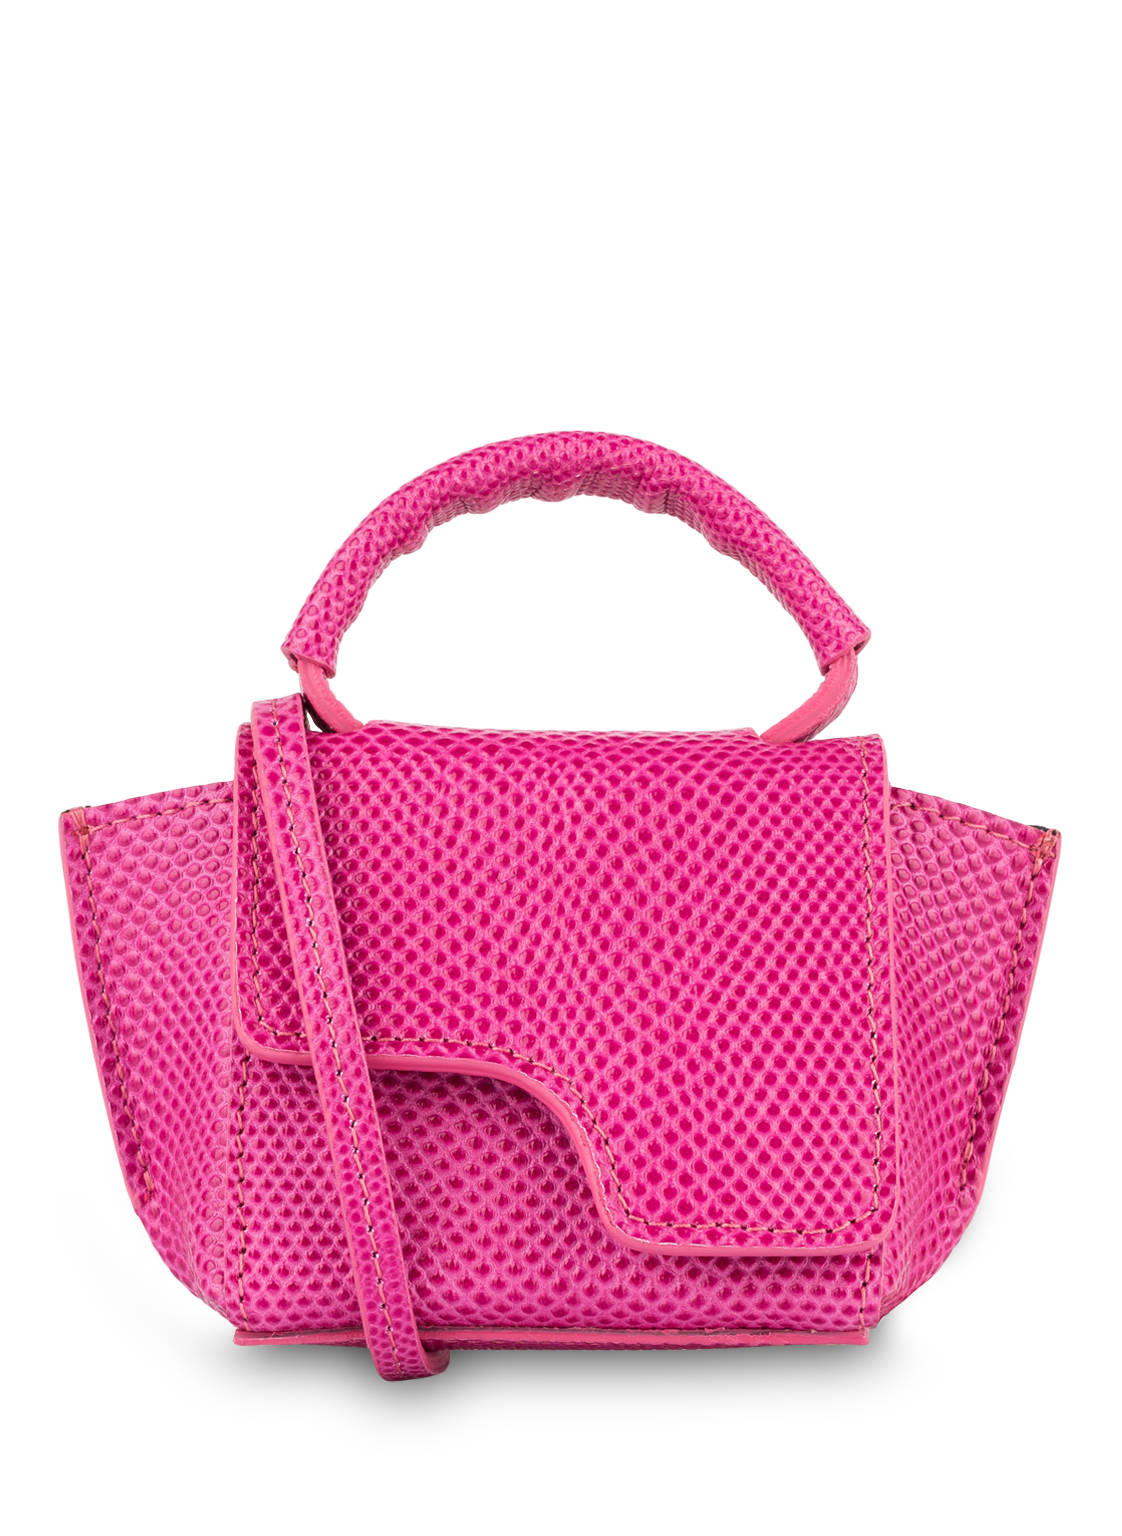 Image of Atp Atelier Micro Bag San Gimignano Mini pink